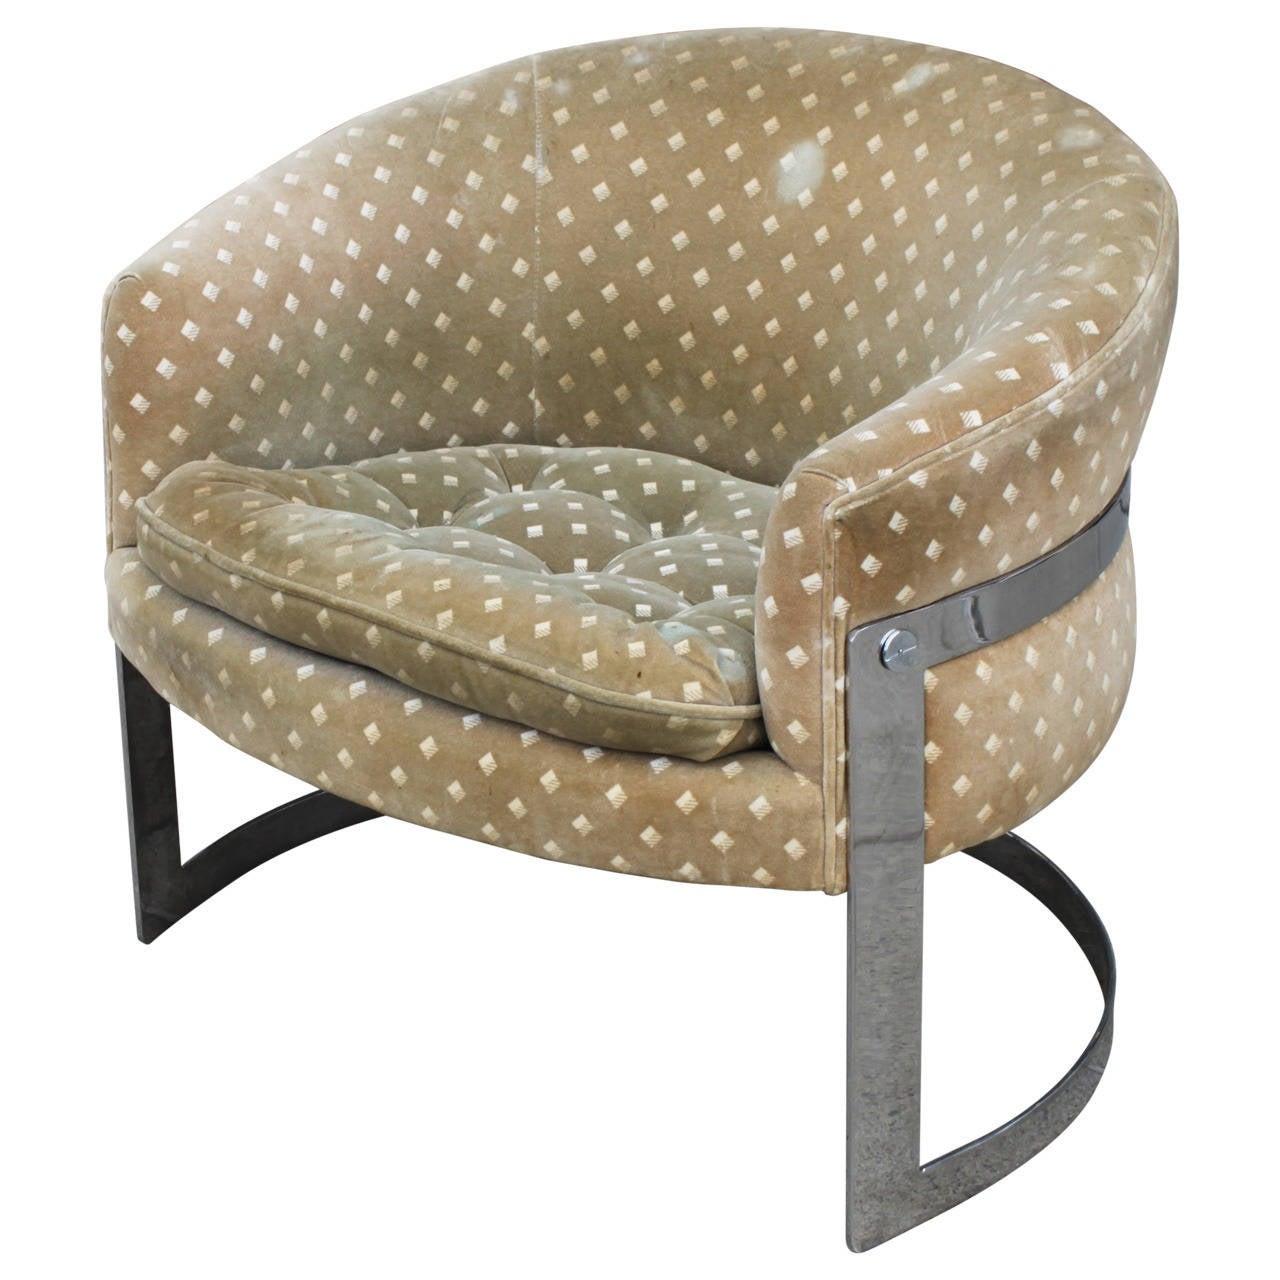 Milo baughman chrome barrel lounge chair at 1stdibs